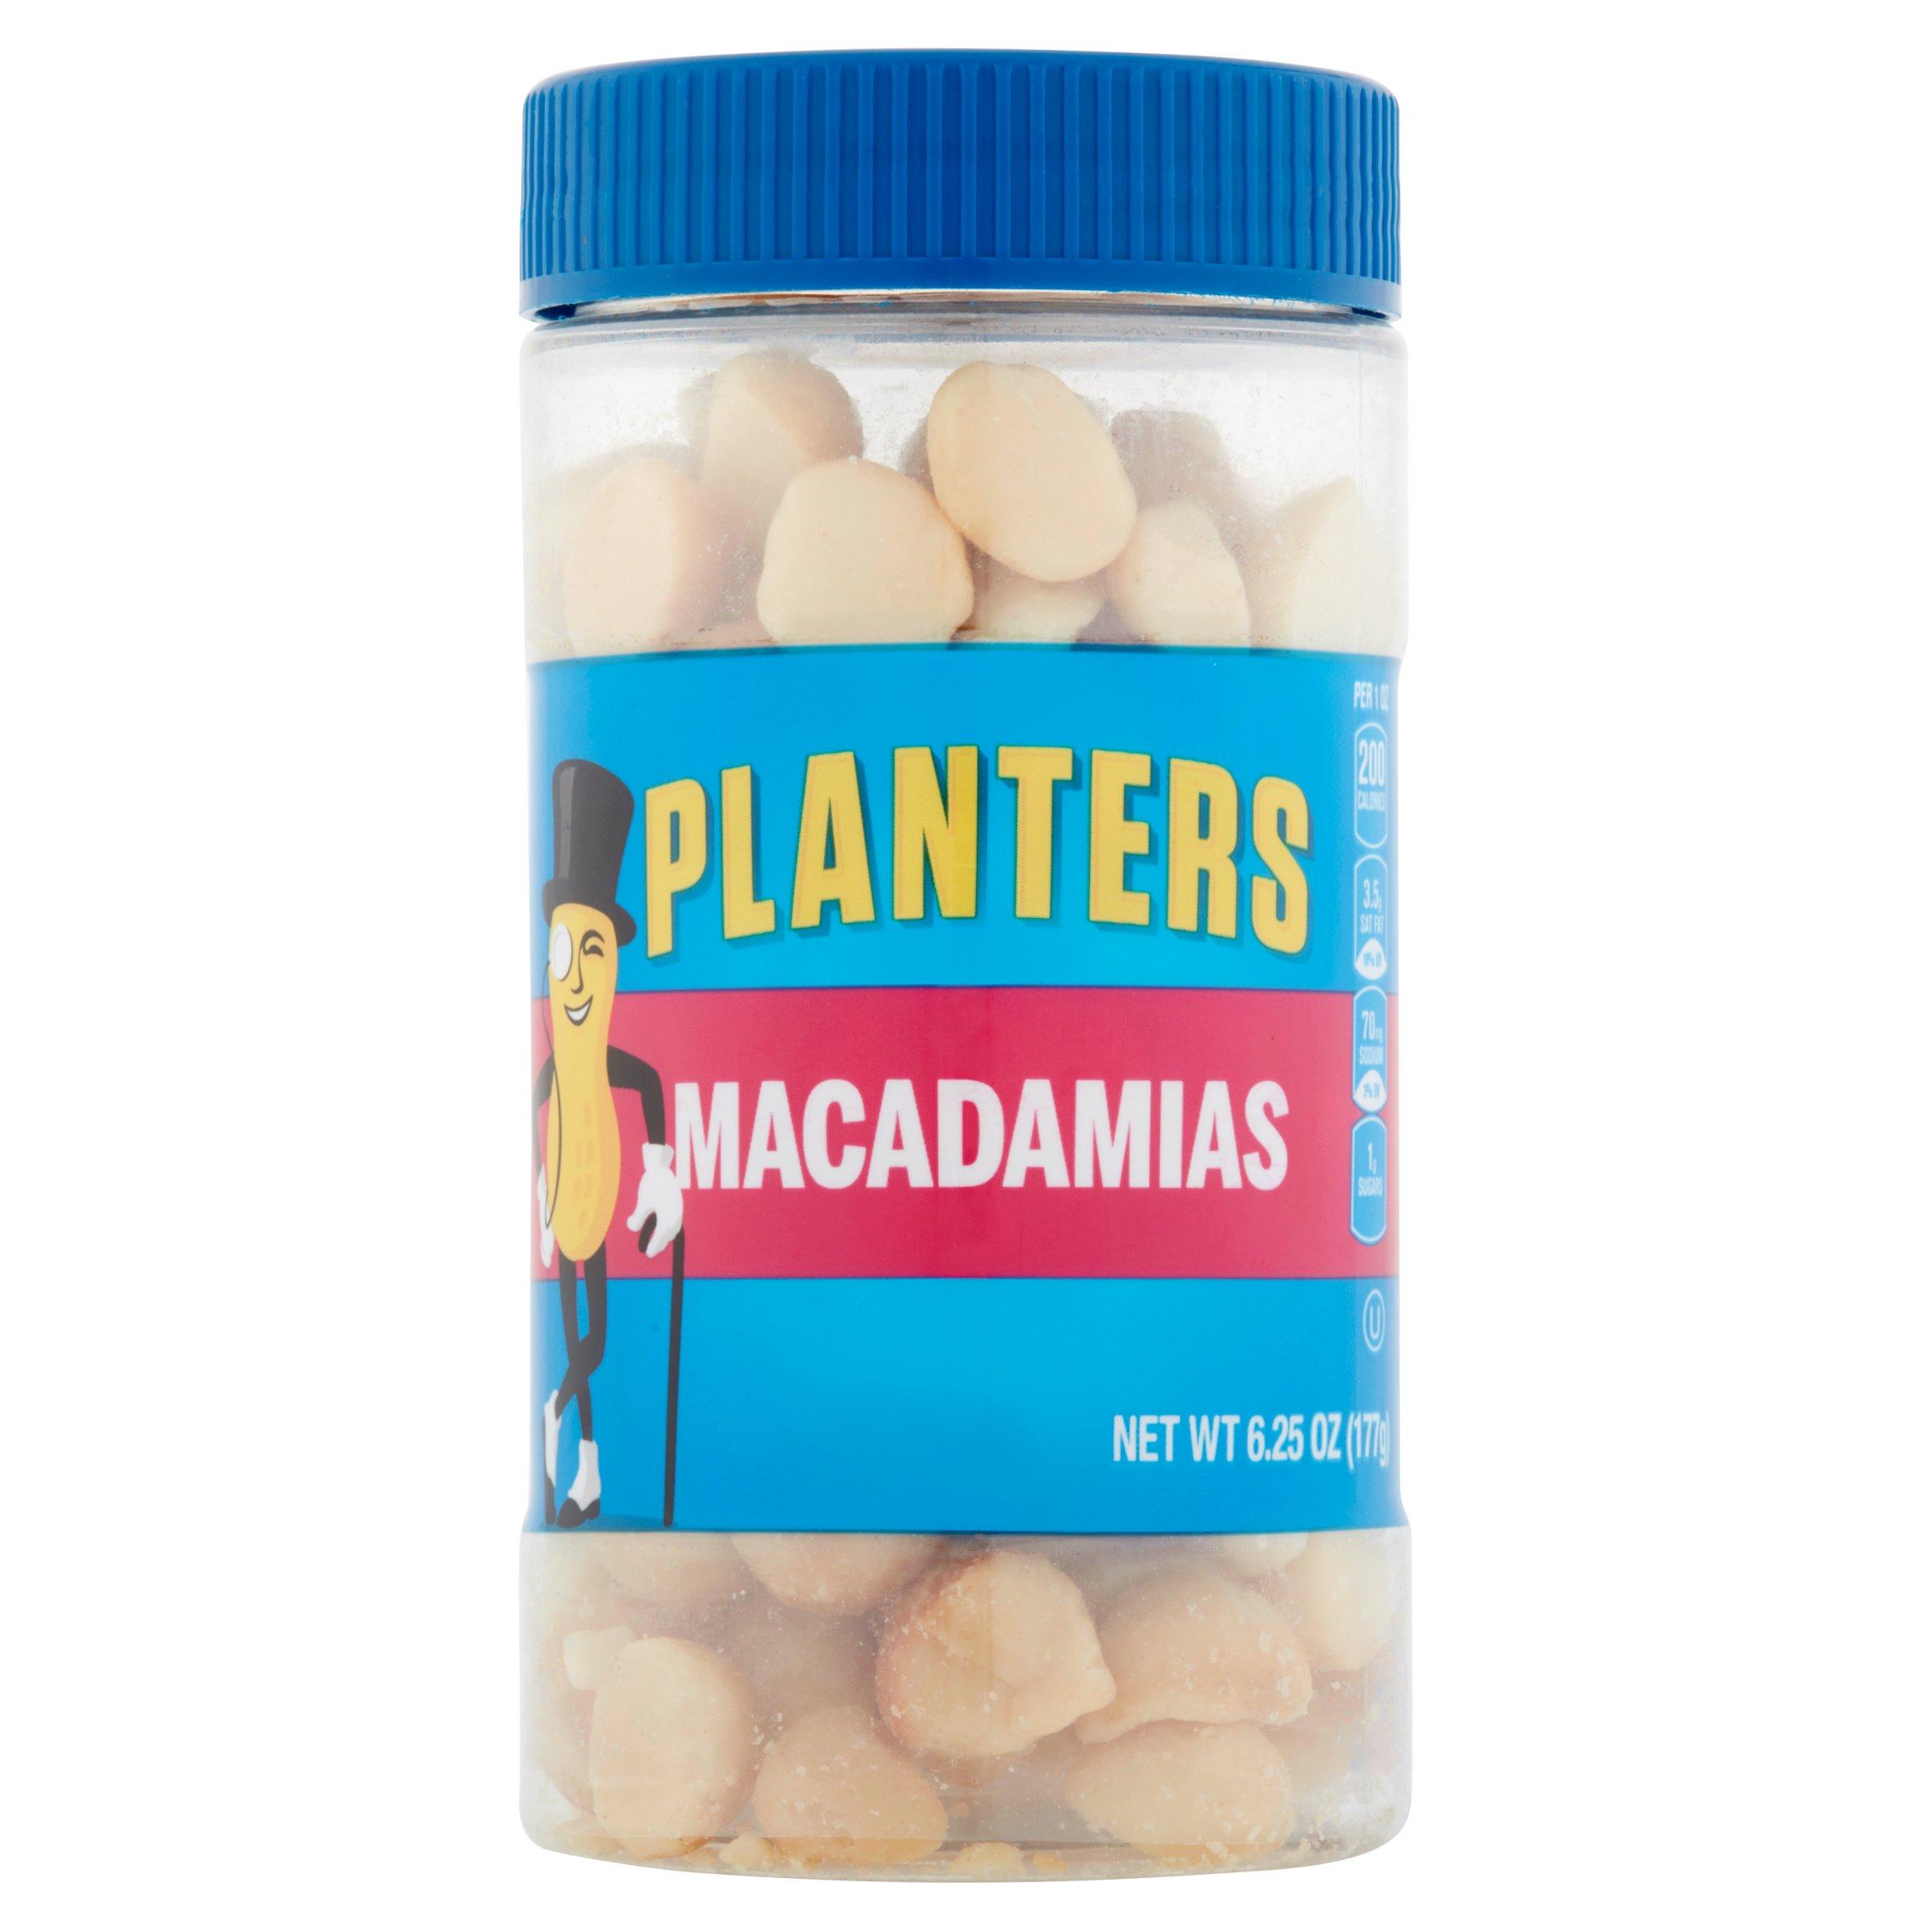 Planters Macadamias, 6.25 OZ (177g)